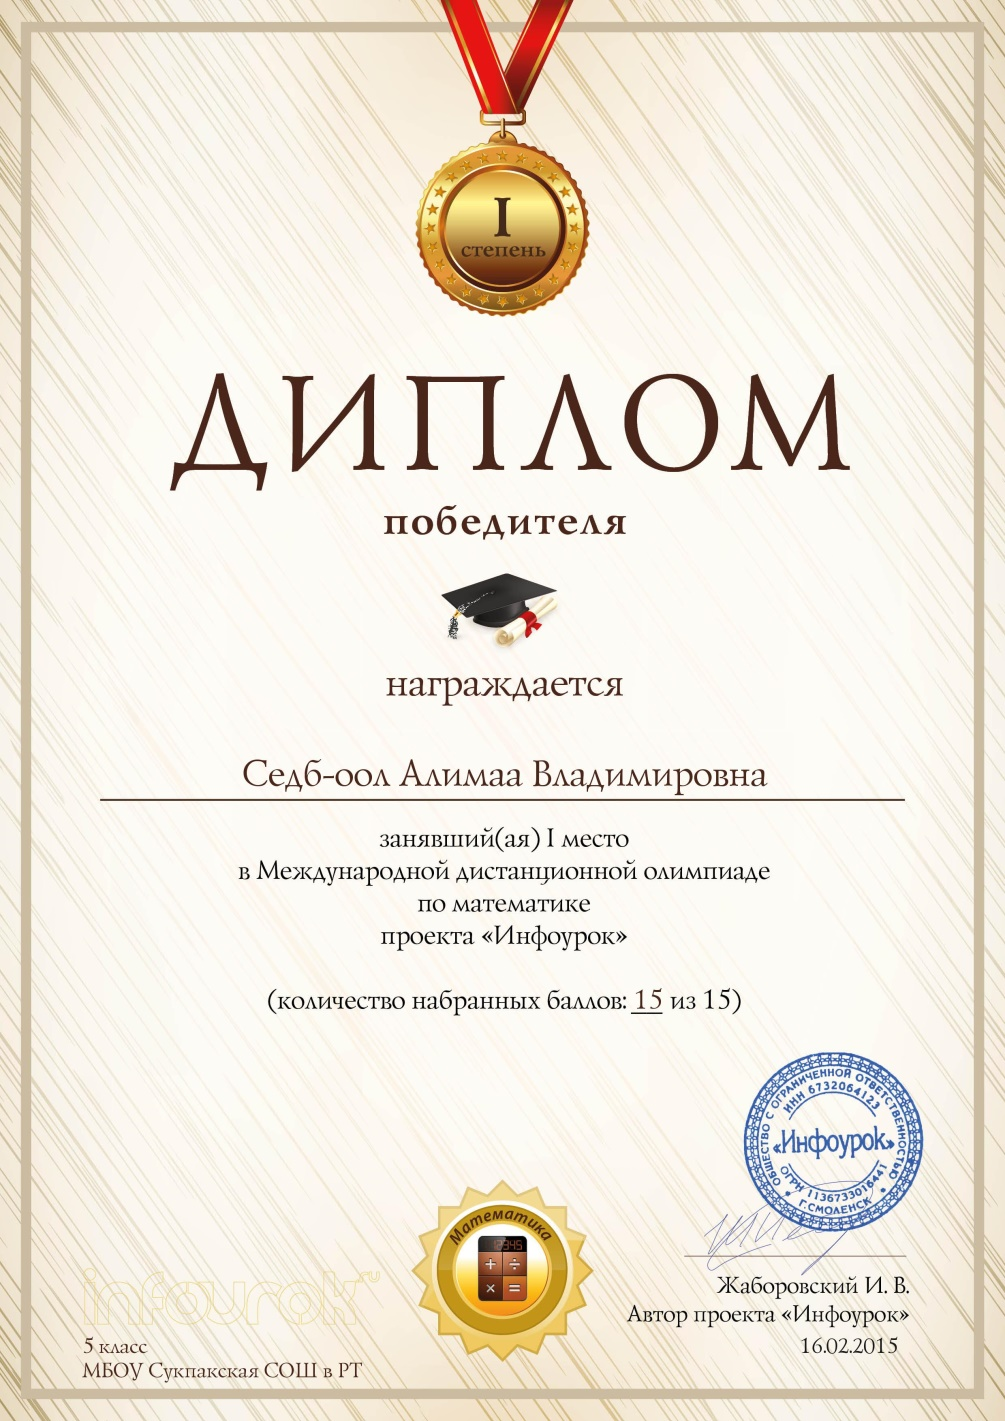 C:\Users\Снежана\Desktop\сертификаты инфоурок\олимпиада результат\format_A5_document_811658.jpg